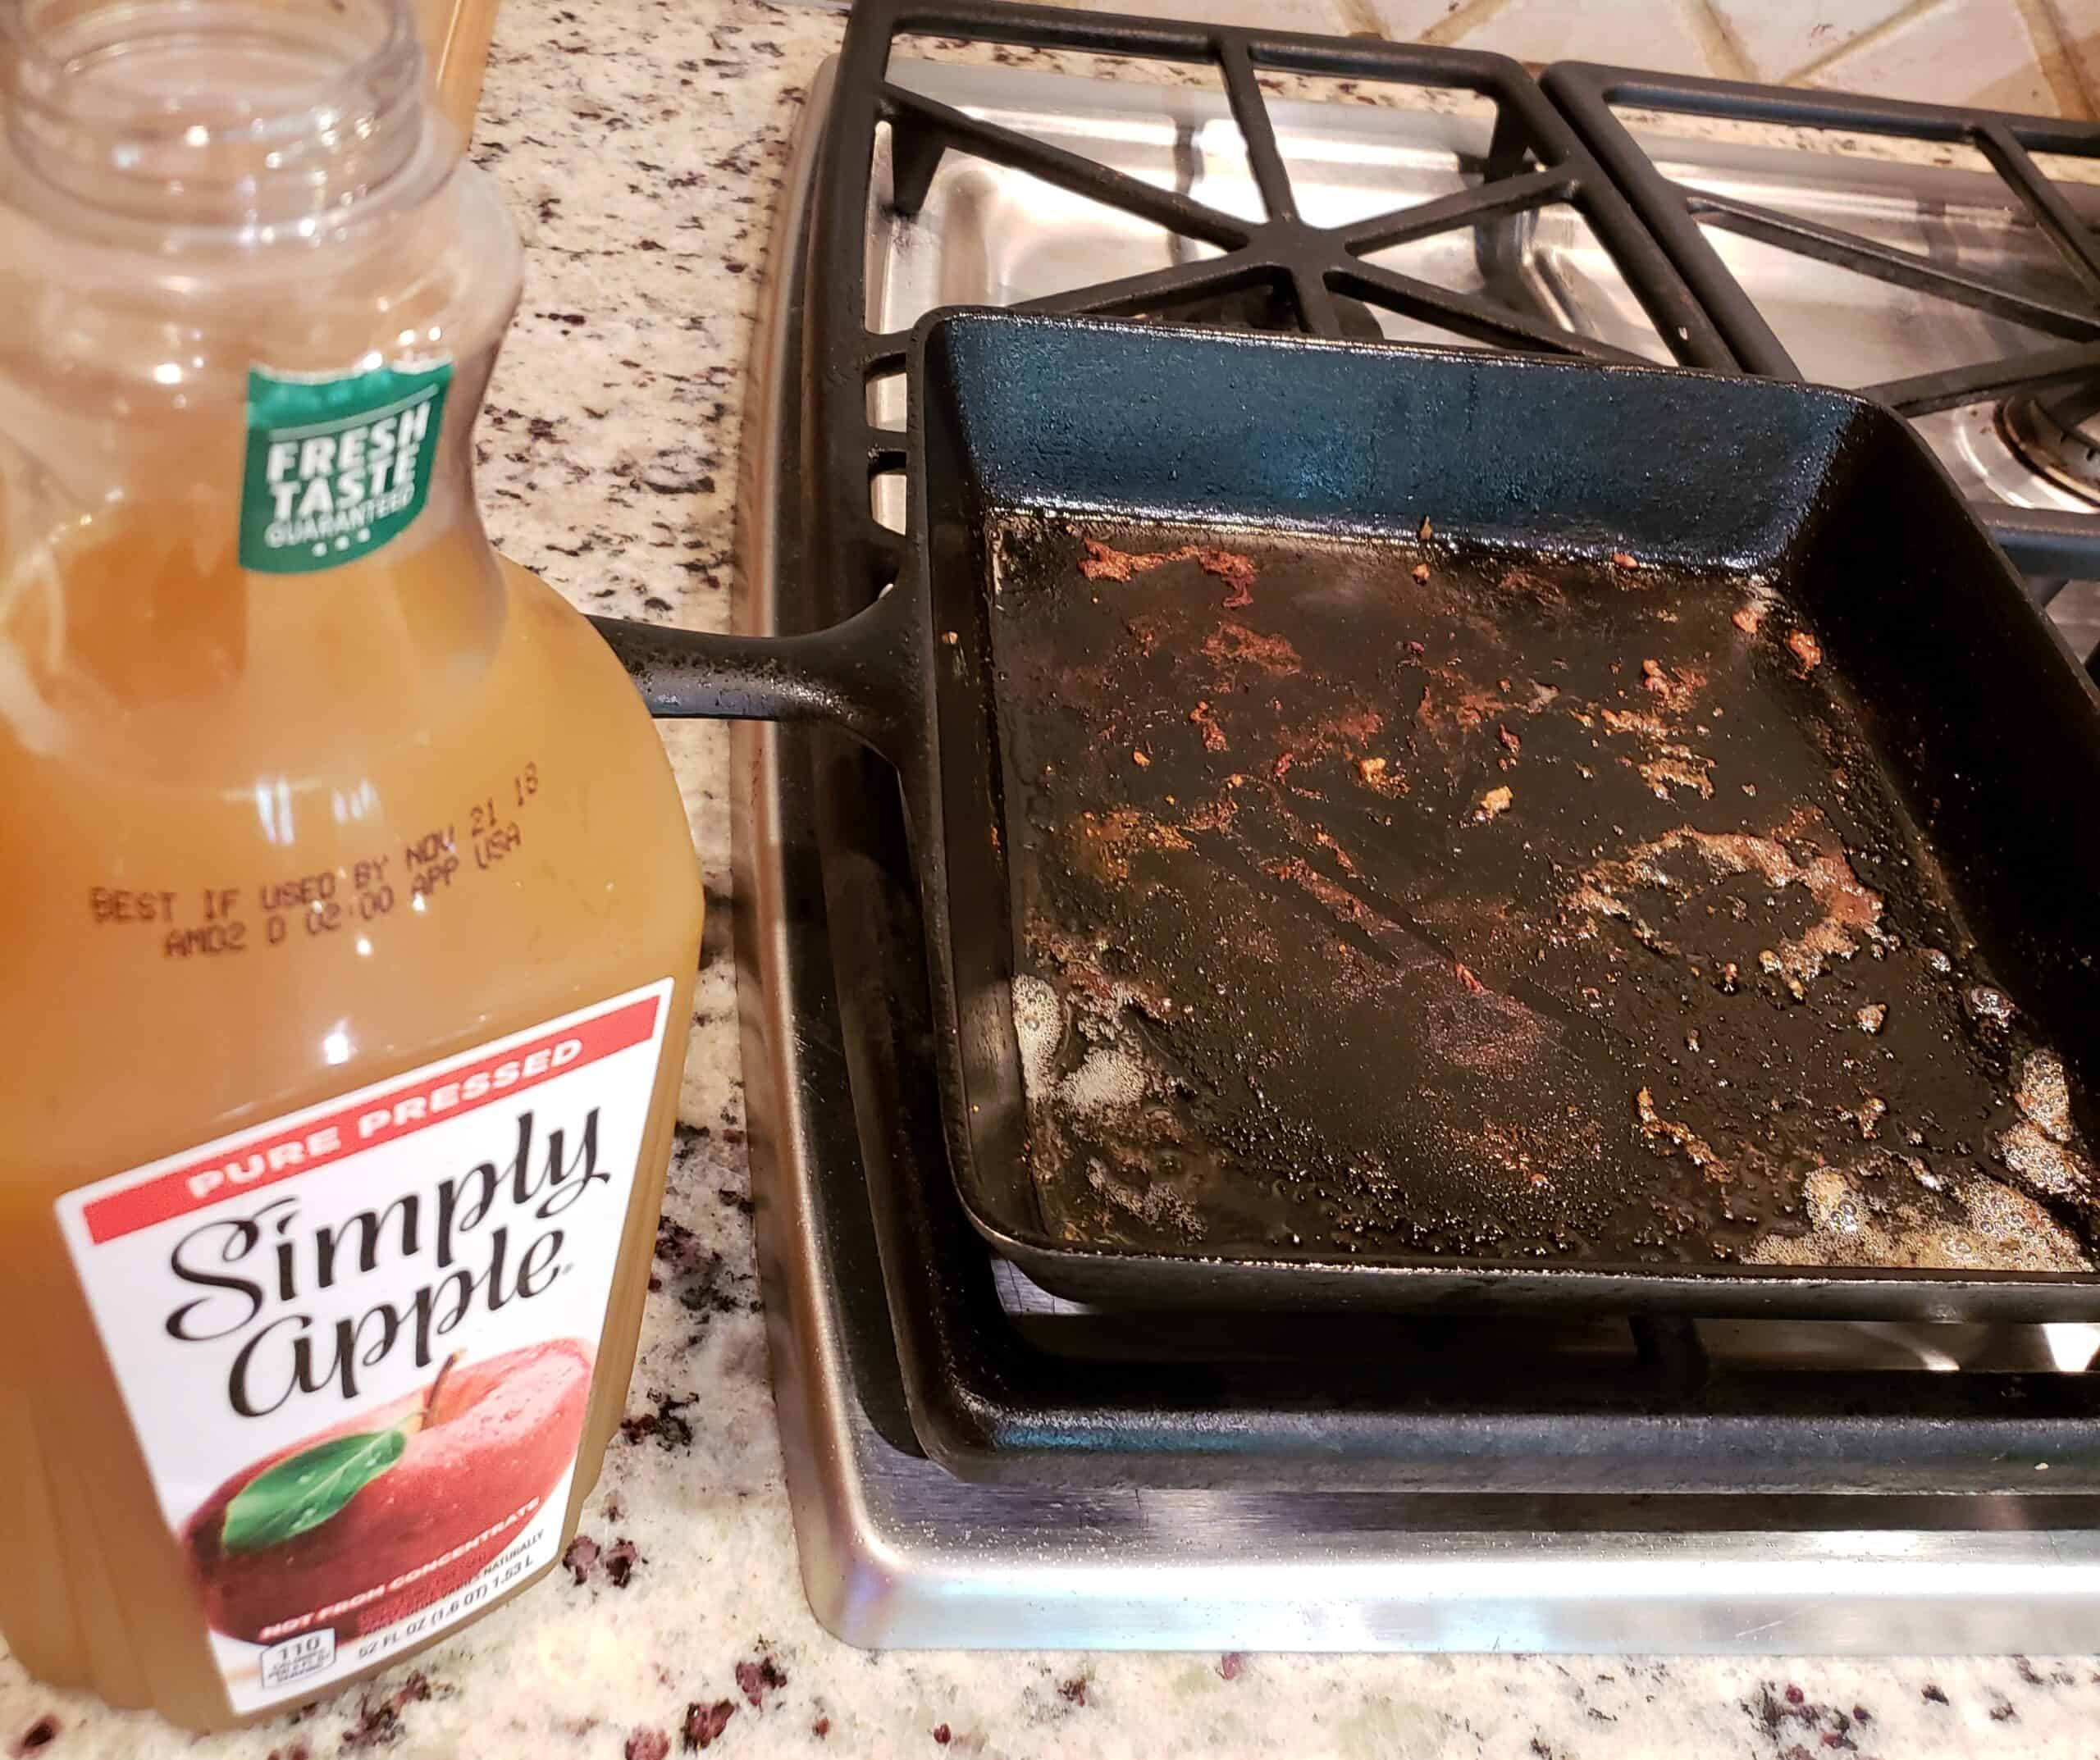 Pan Seared Pork Chops browned bits and Simply Cider jug